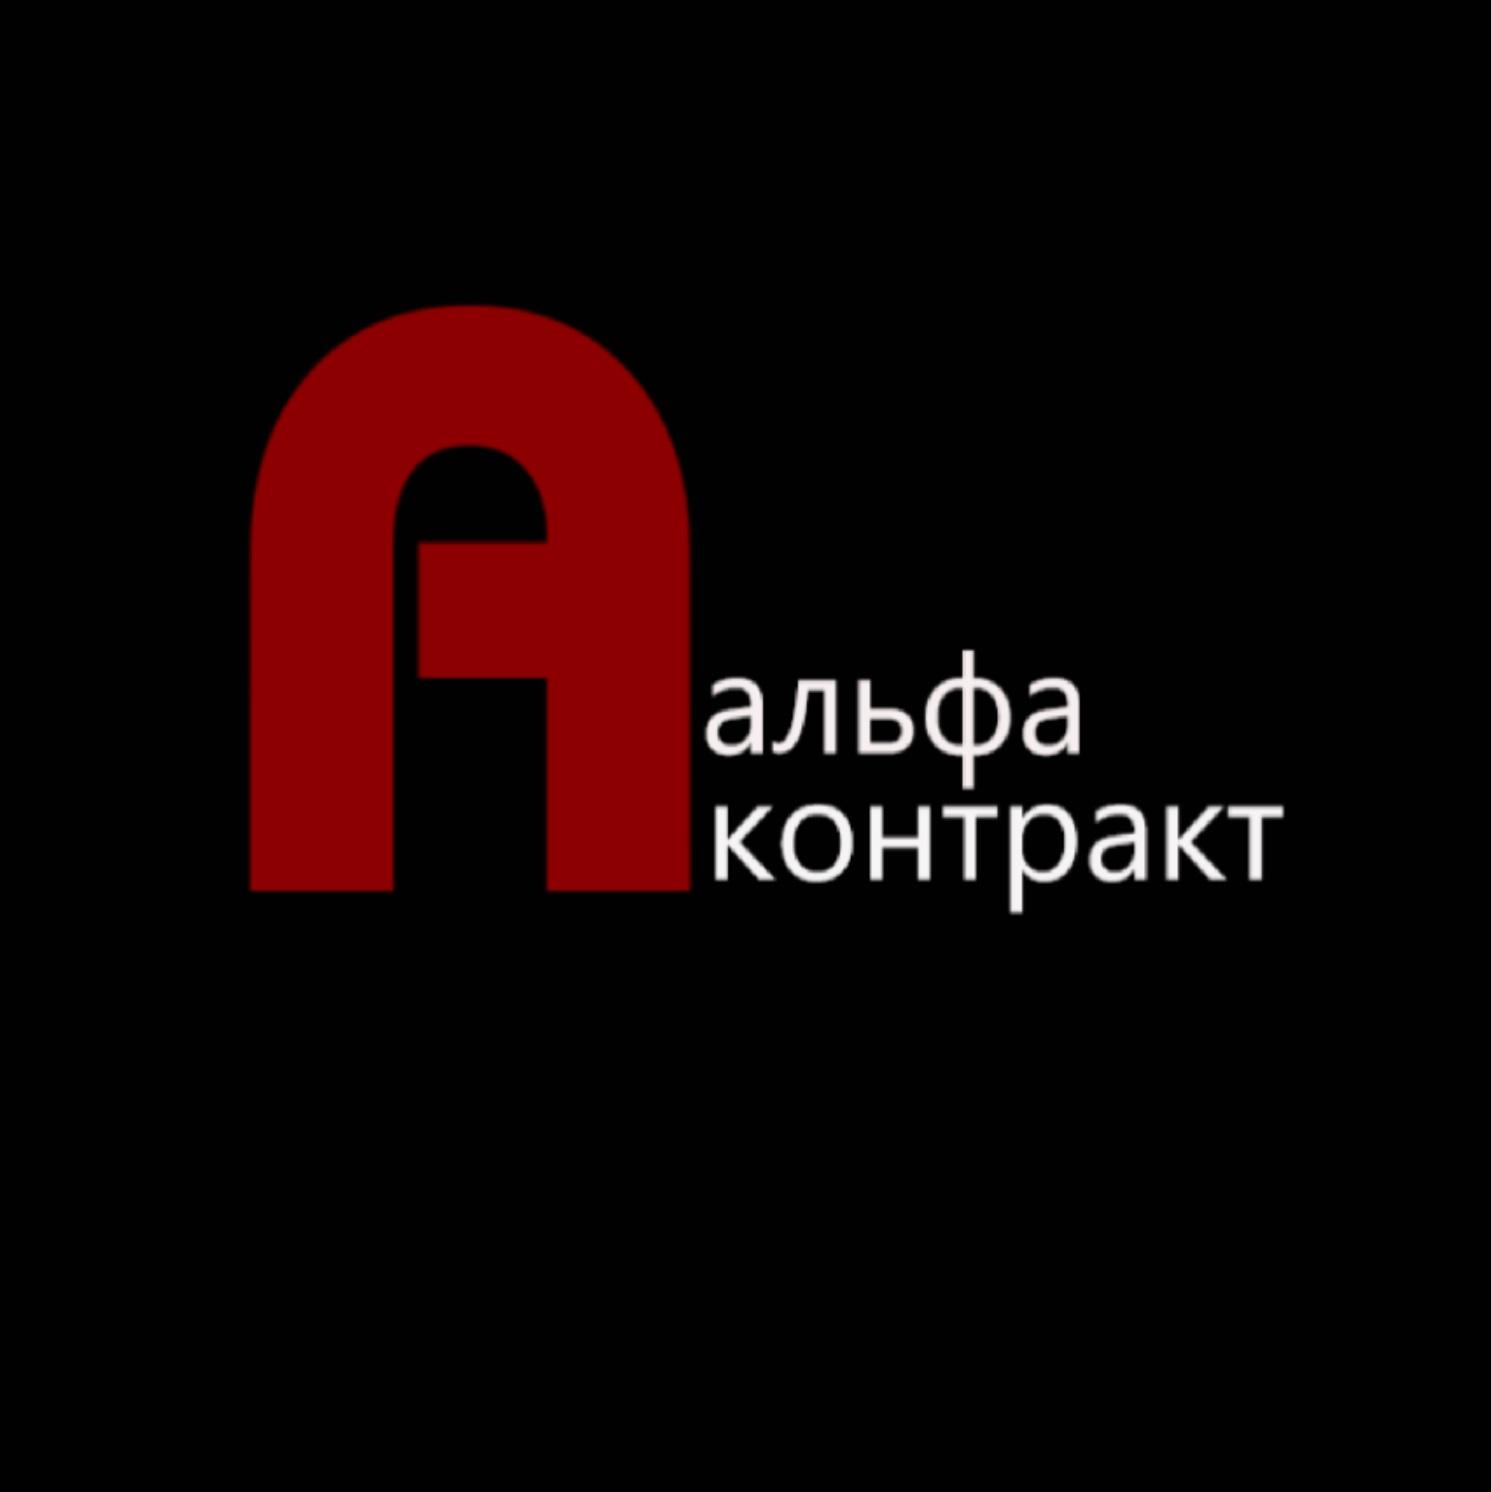 Дизайнер для разработки логотипа компании фото f_6995bfc1174892f0.png